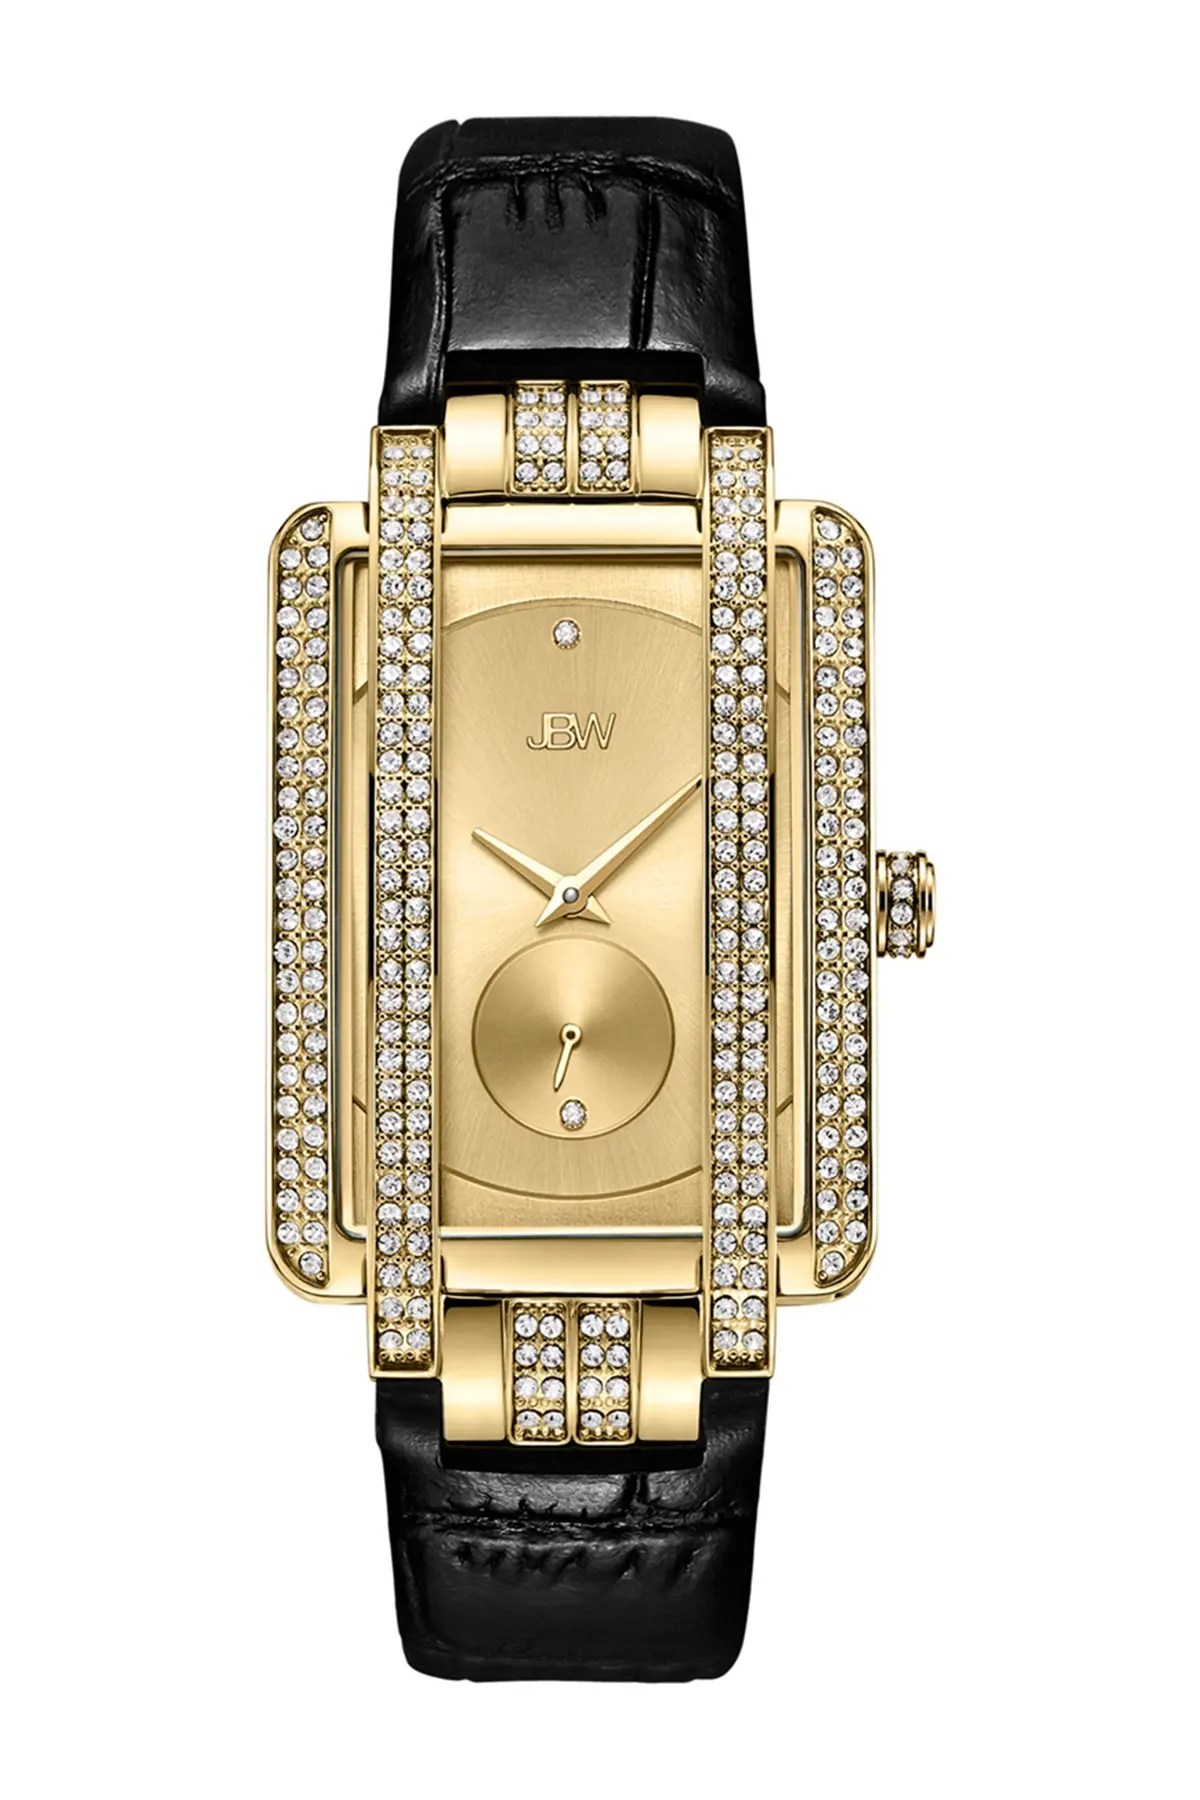 jewelry watches nordstrom rack